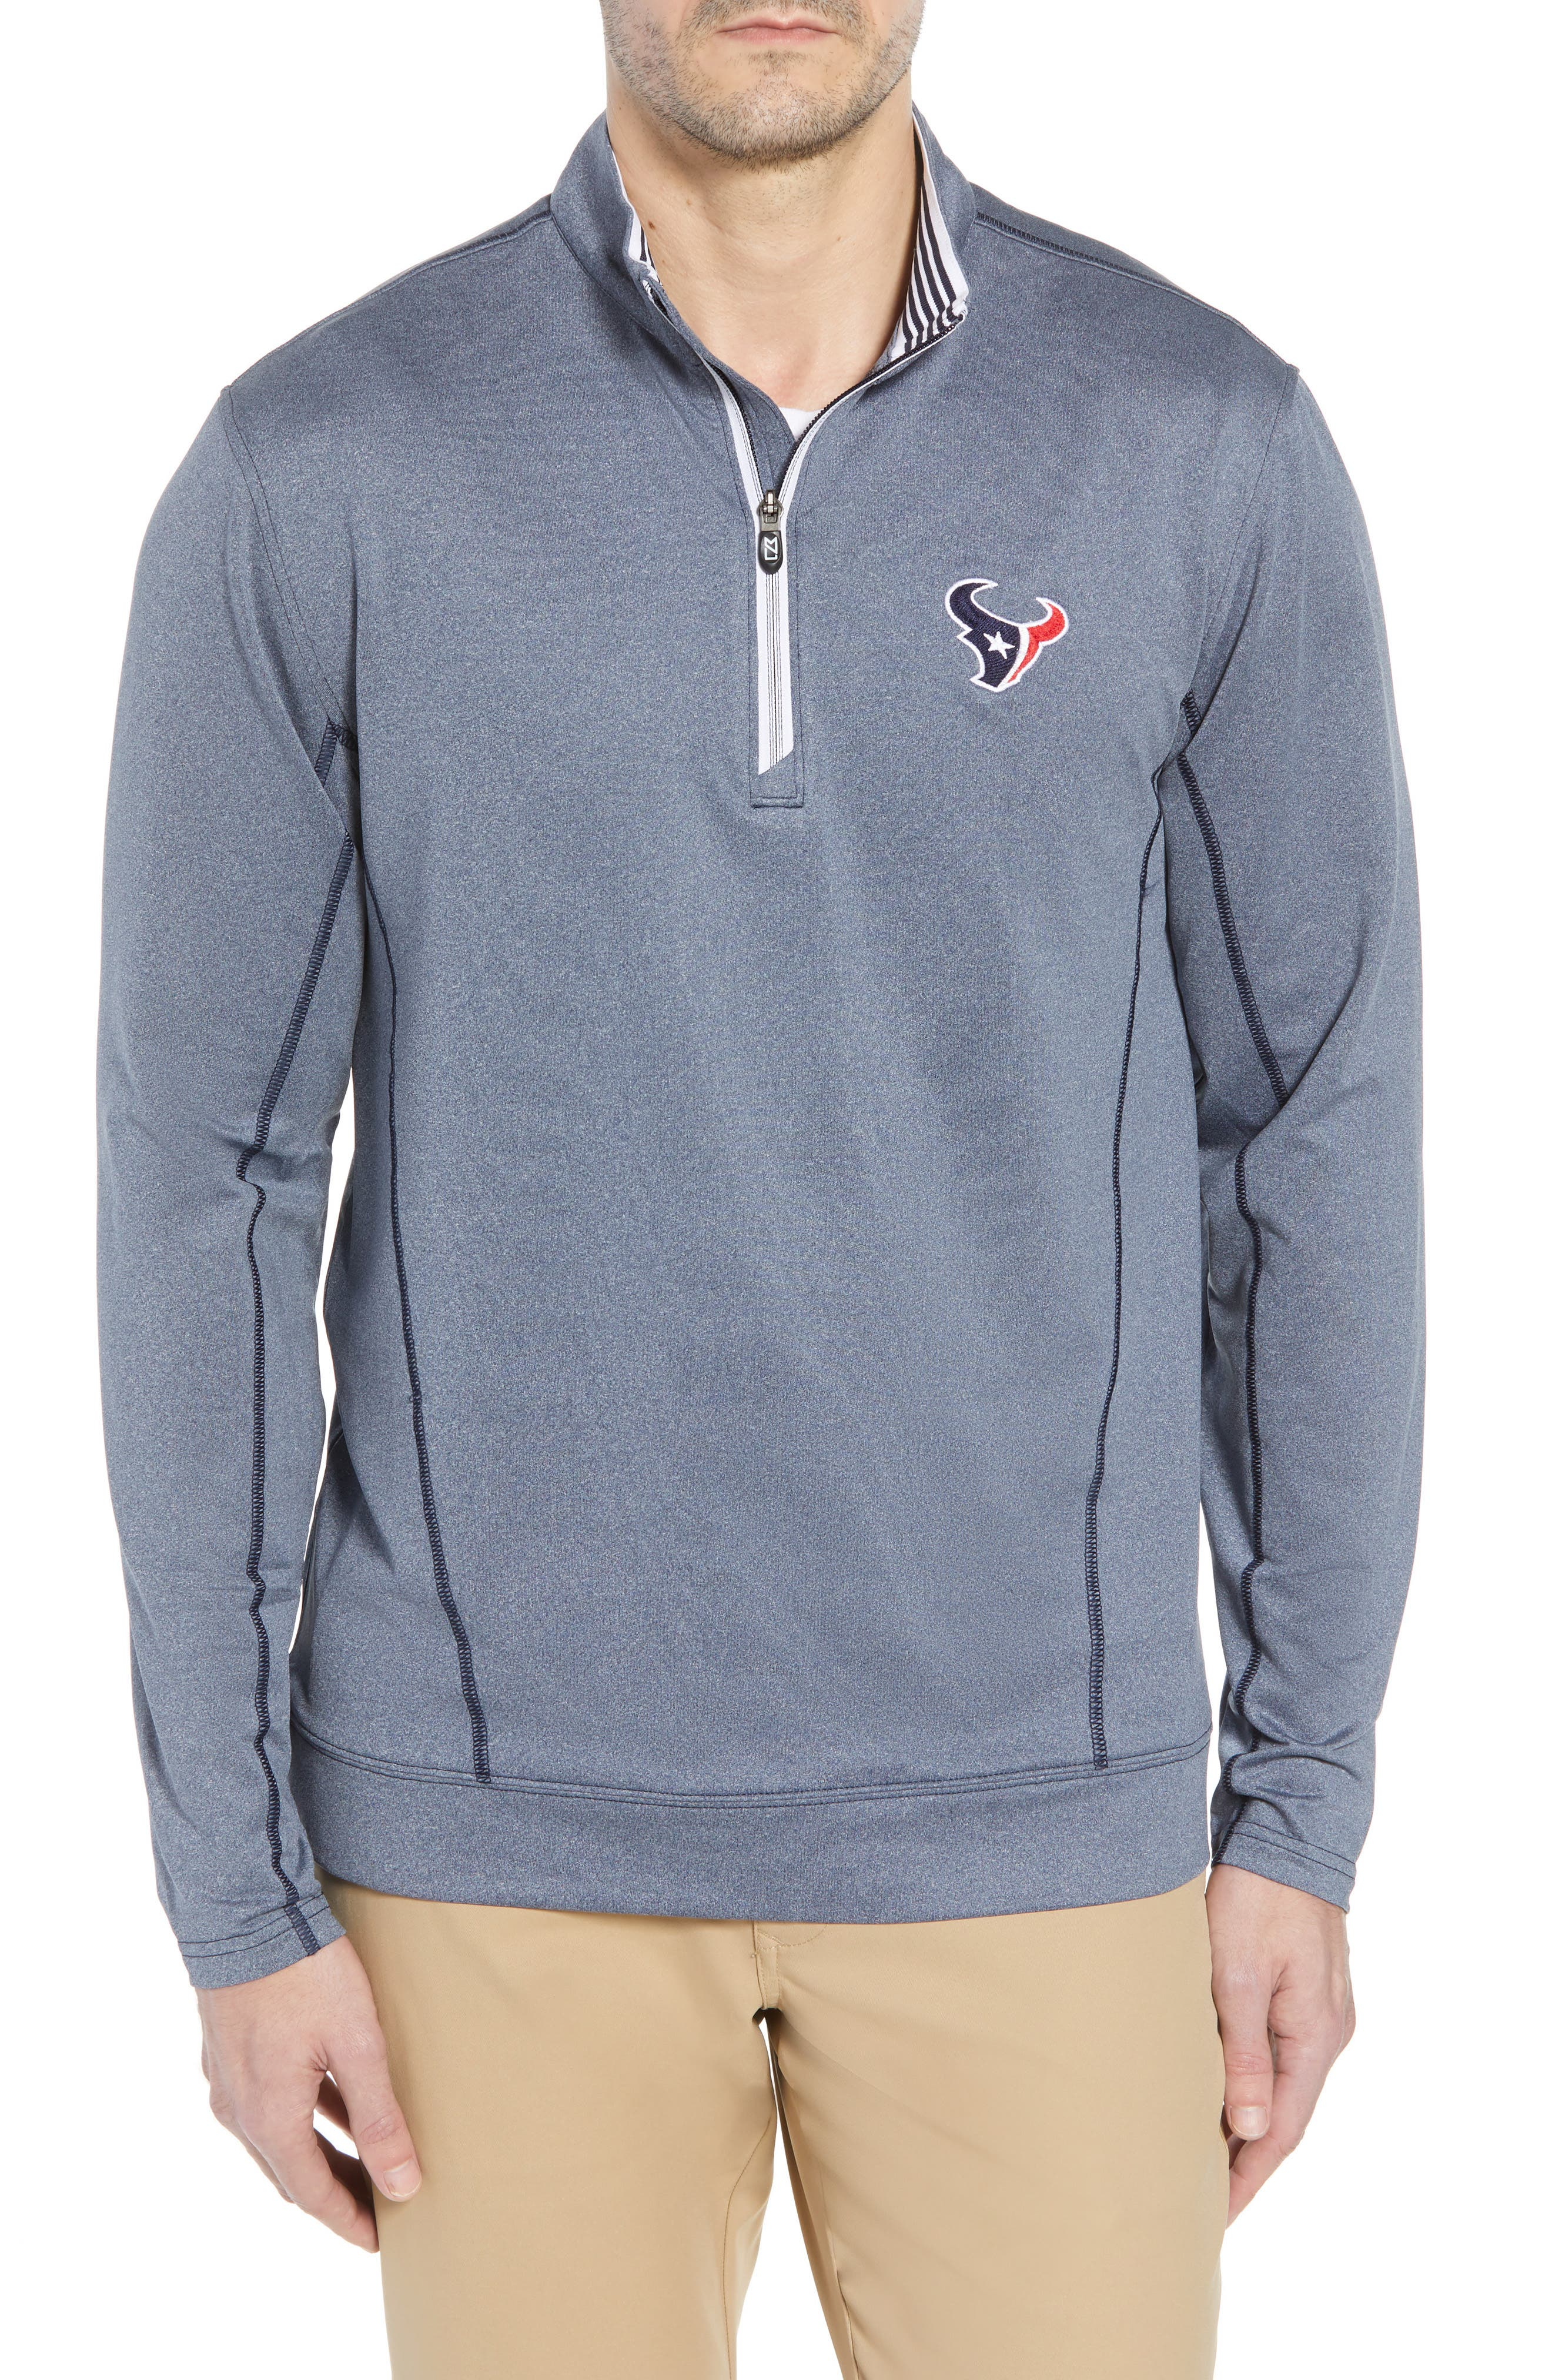 Endurance Houston Texans Regular Fit Pullover,                         Main,                         color, LIBERTY NAVY HEATHER